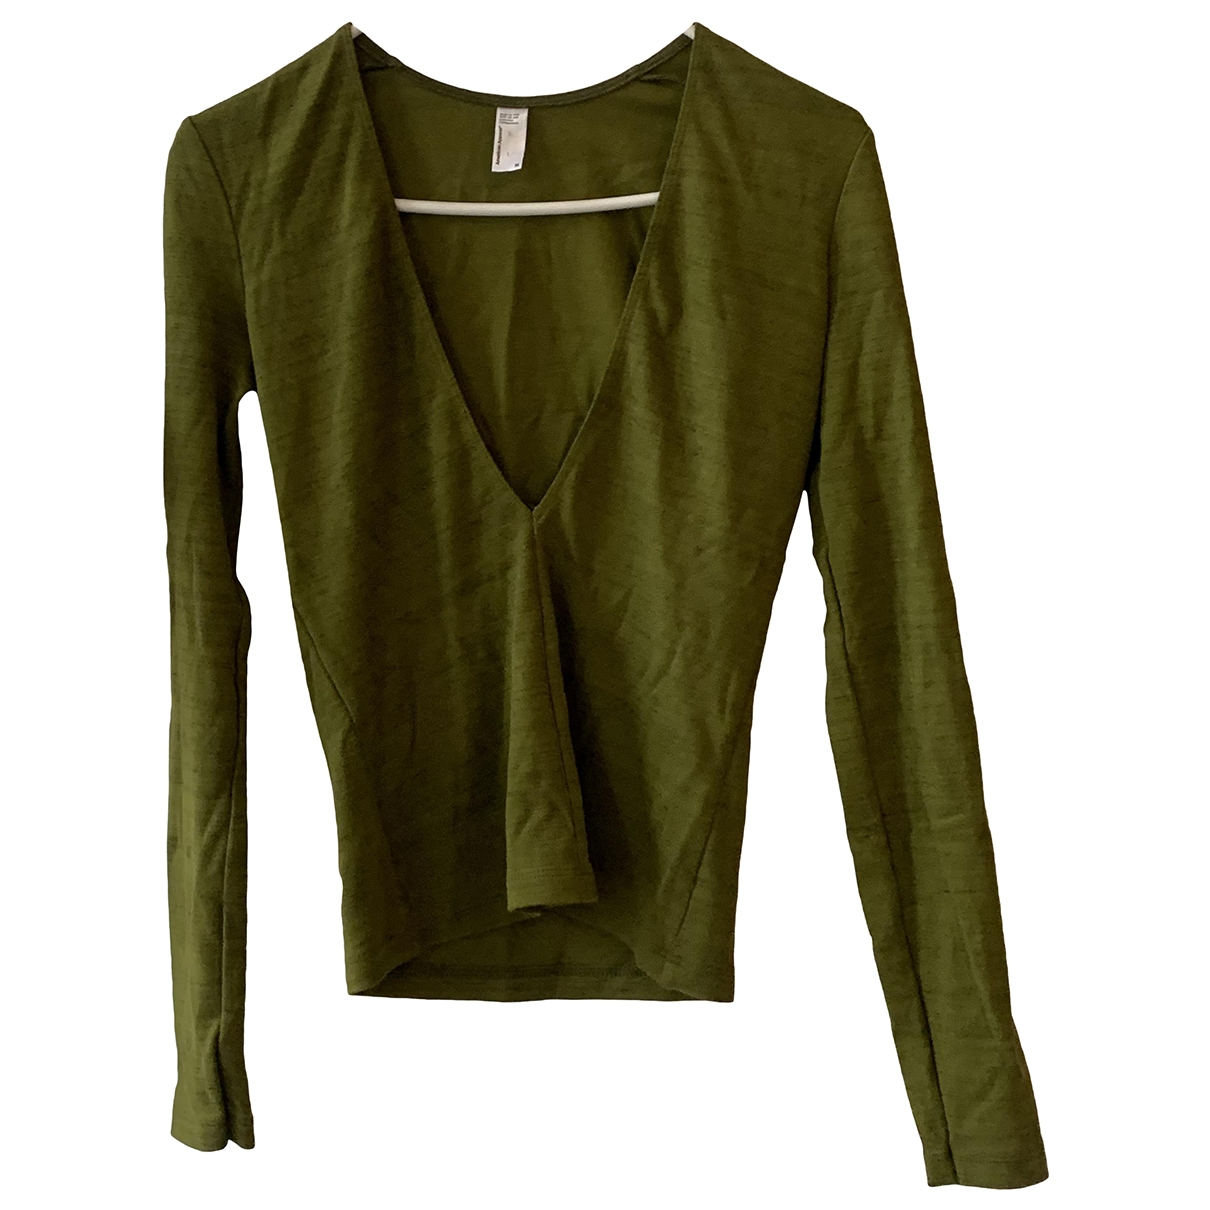 American Apparel \N Khaki Cotton  top for Women M International